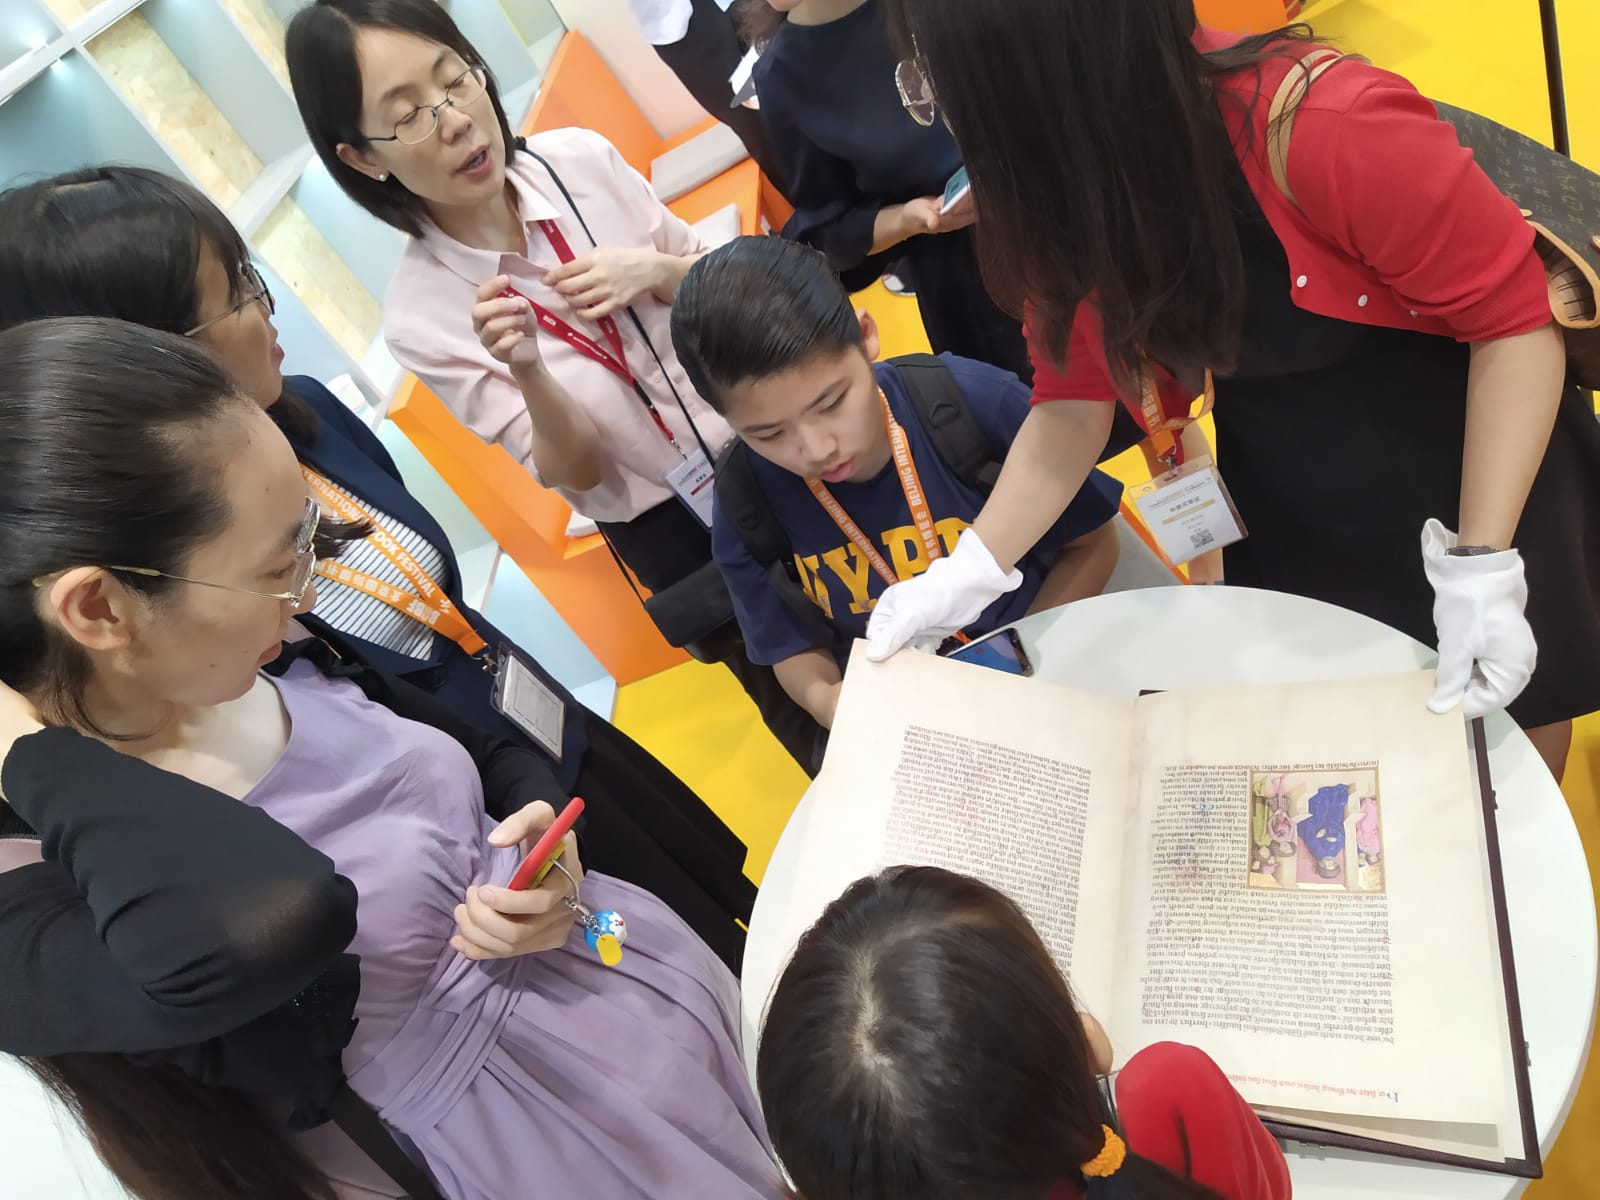 BIBF 2019, book fair, beijing, peking, messe, asien, deutscher pavillon, german pavilion